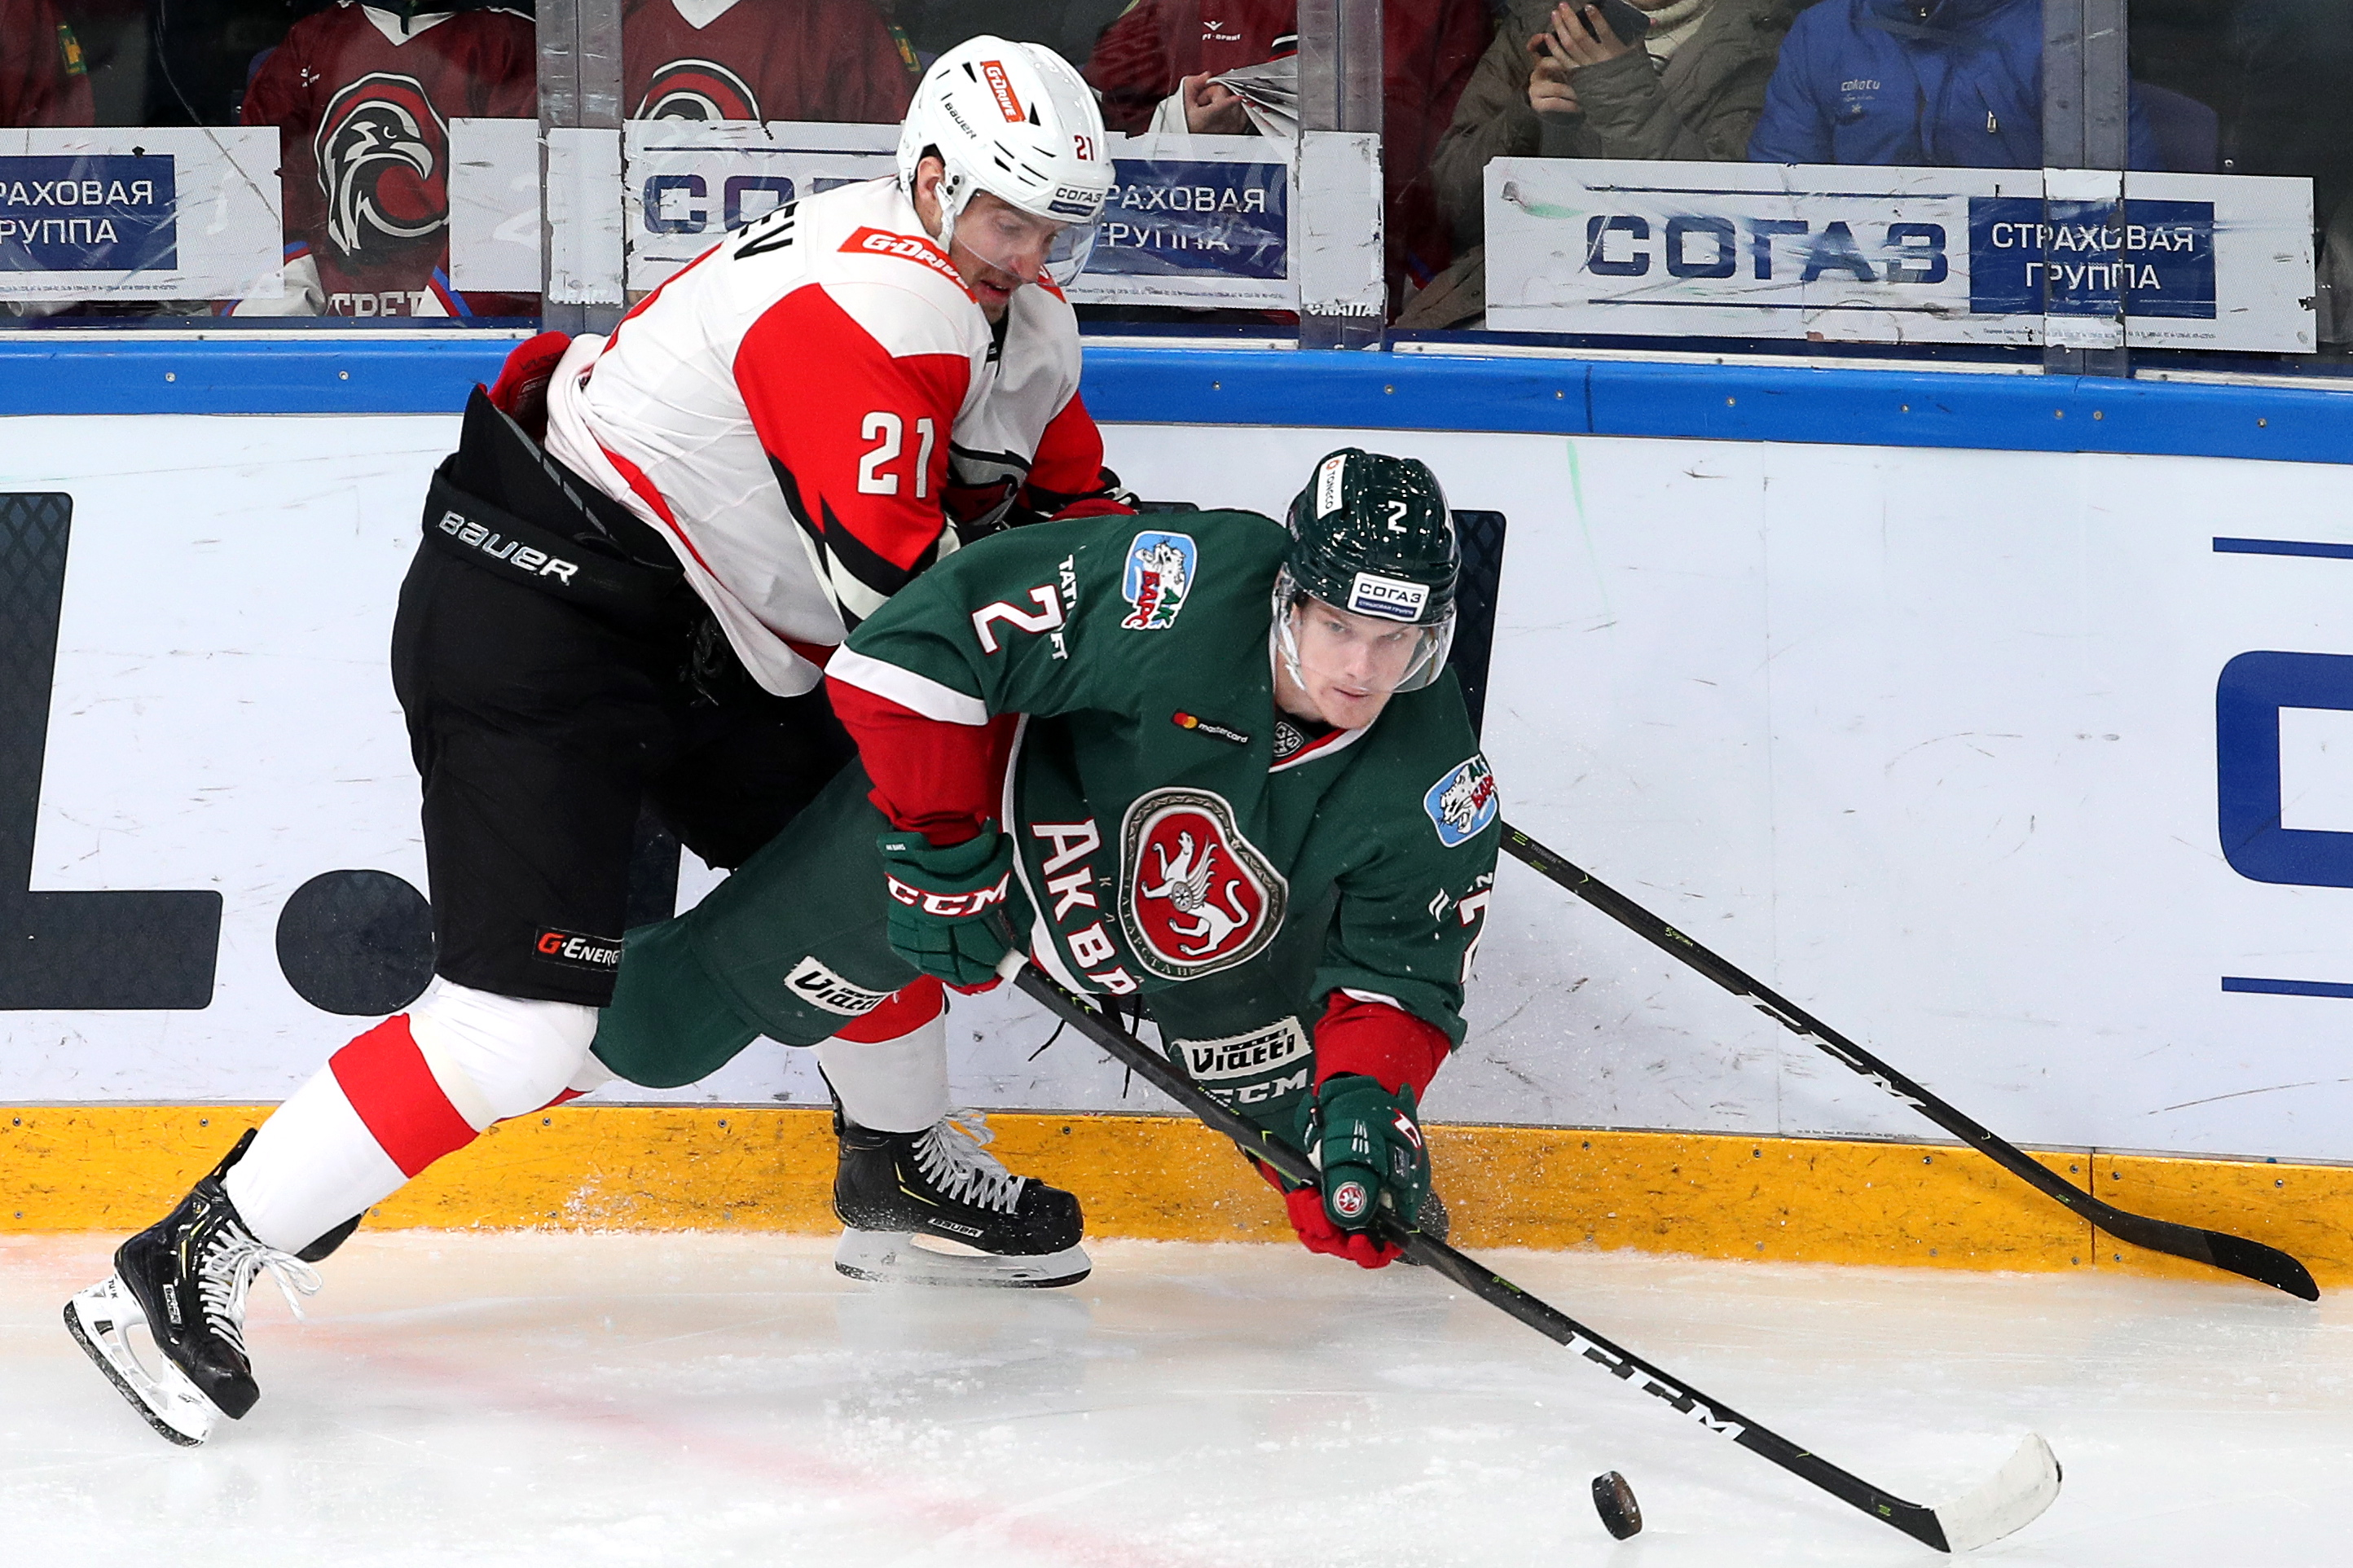 Kontinental Hockey League: Ak Bars Kazan vs Avangard Omsk